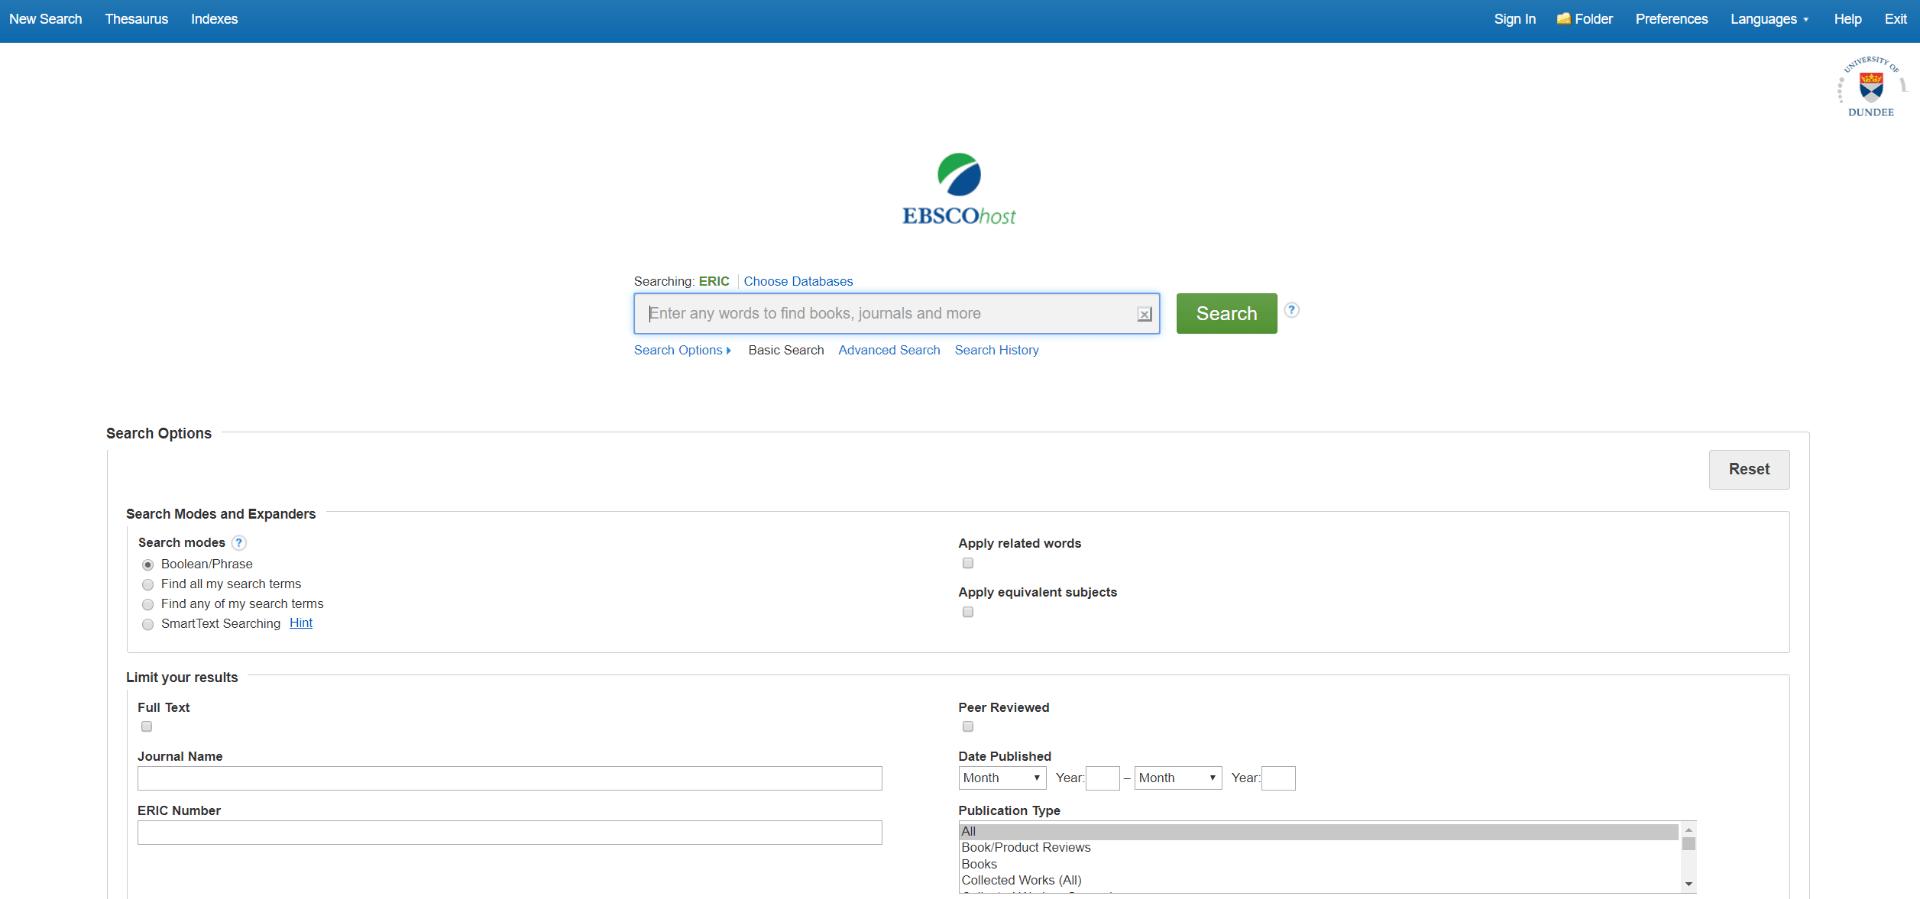 EBSCO database